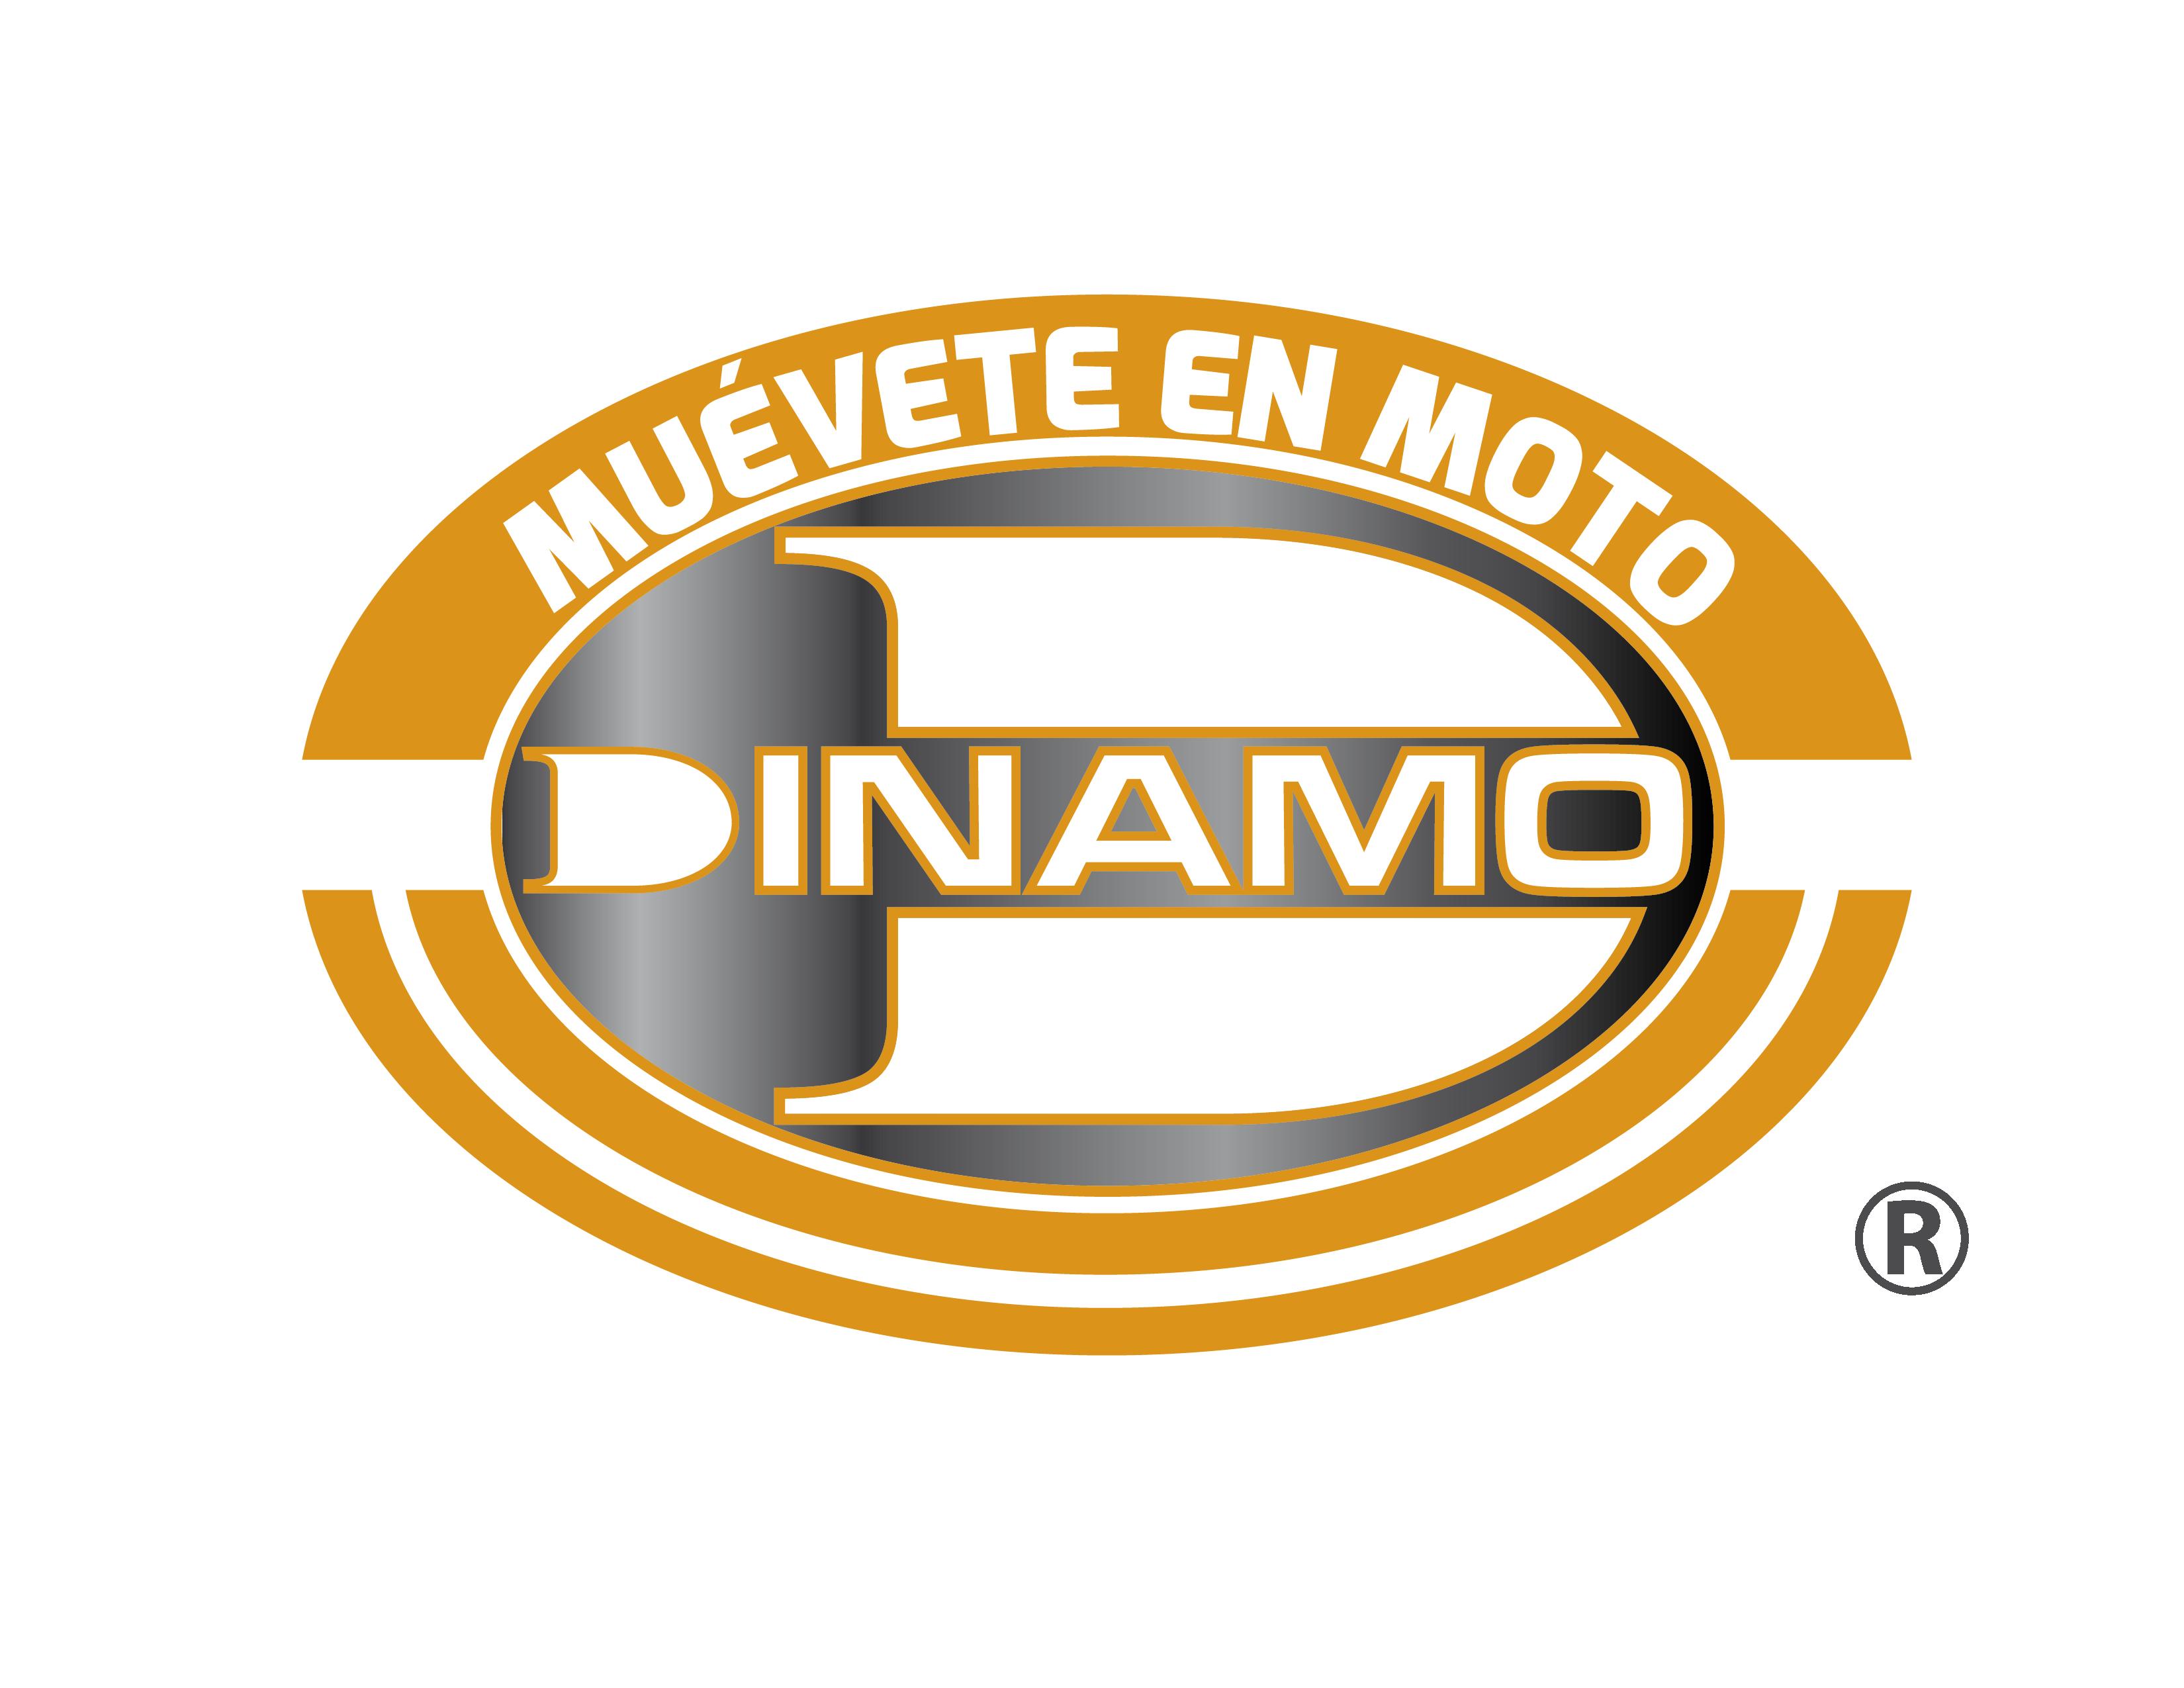 www.dinamotos.mx